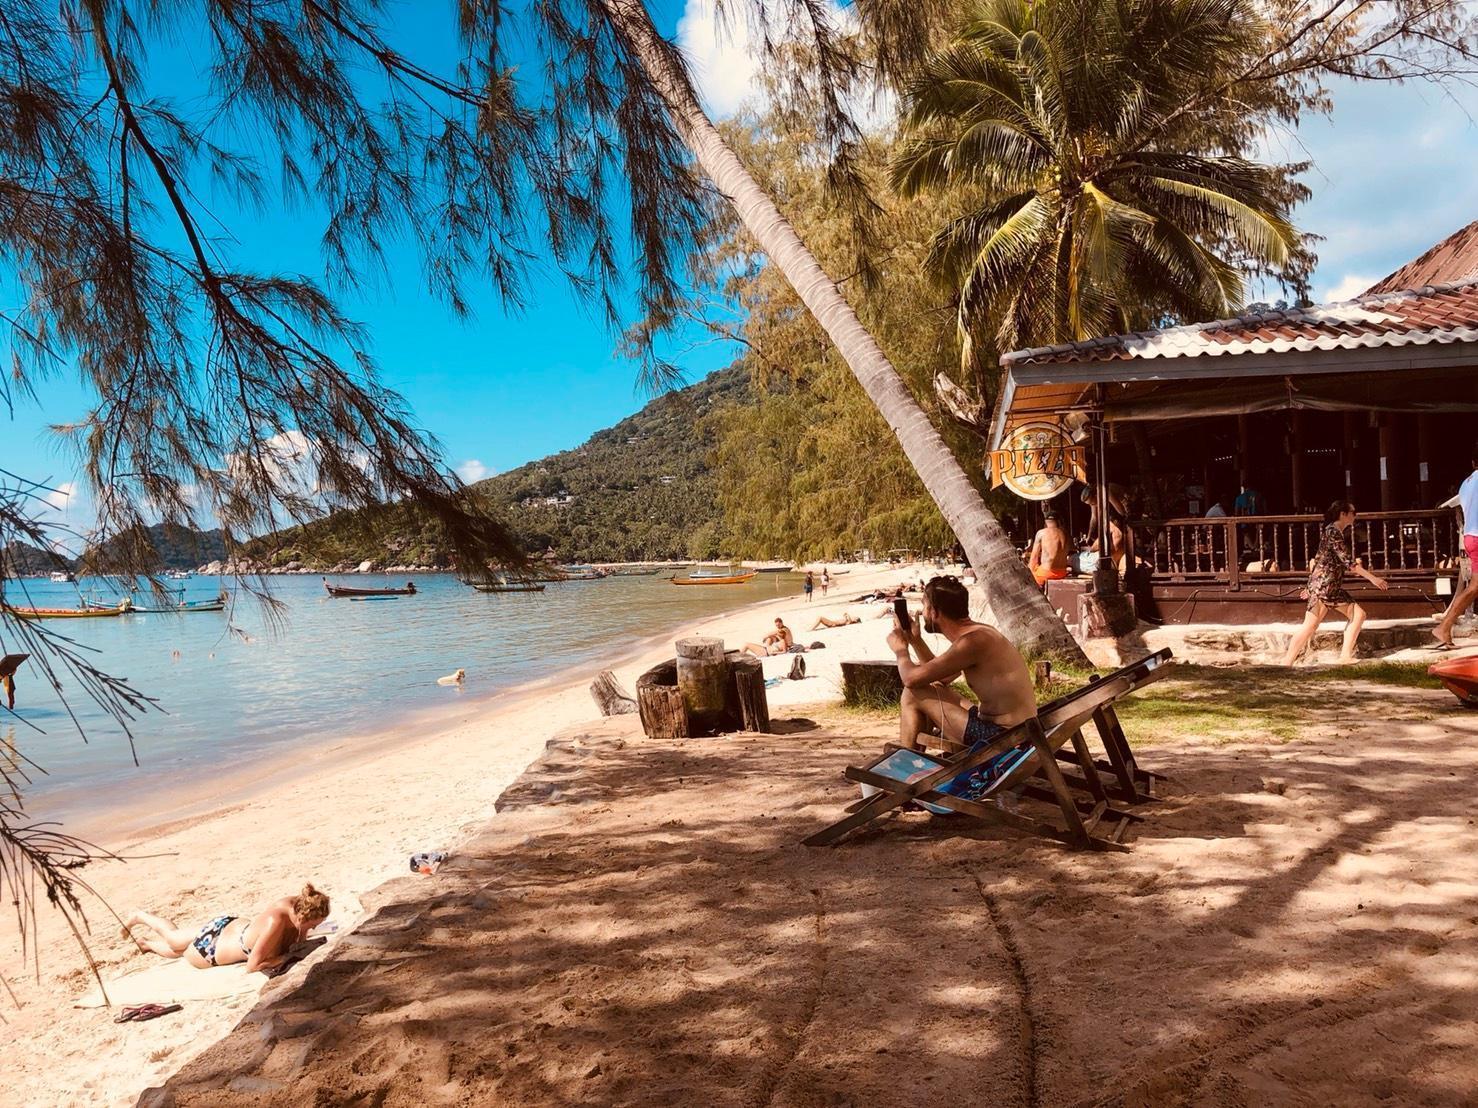 Sairee Cottage Resort ทรายรี คอตเทจ รีสอร์ต